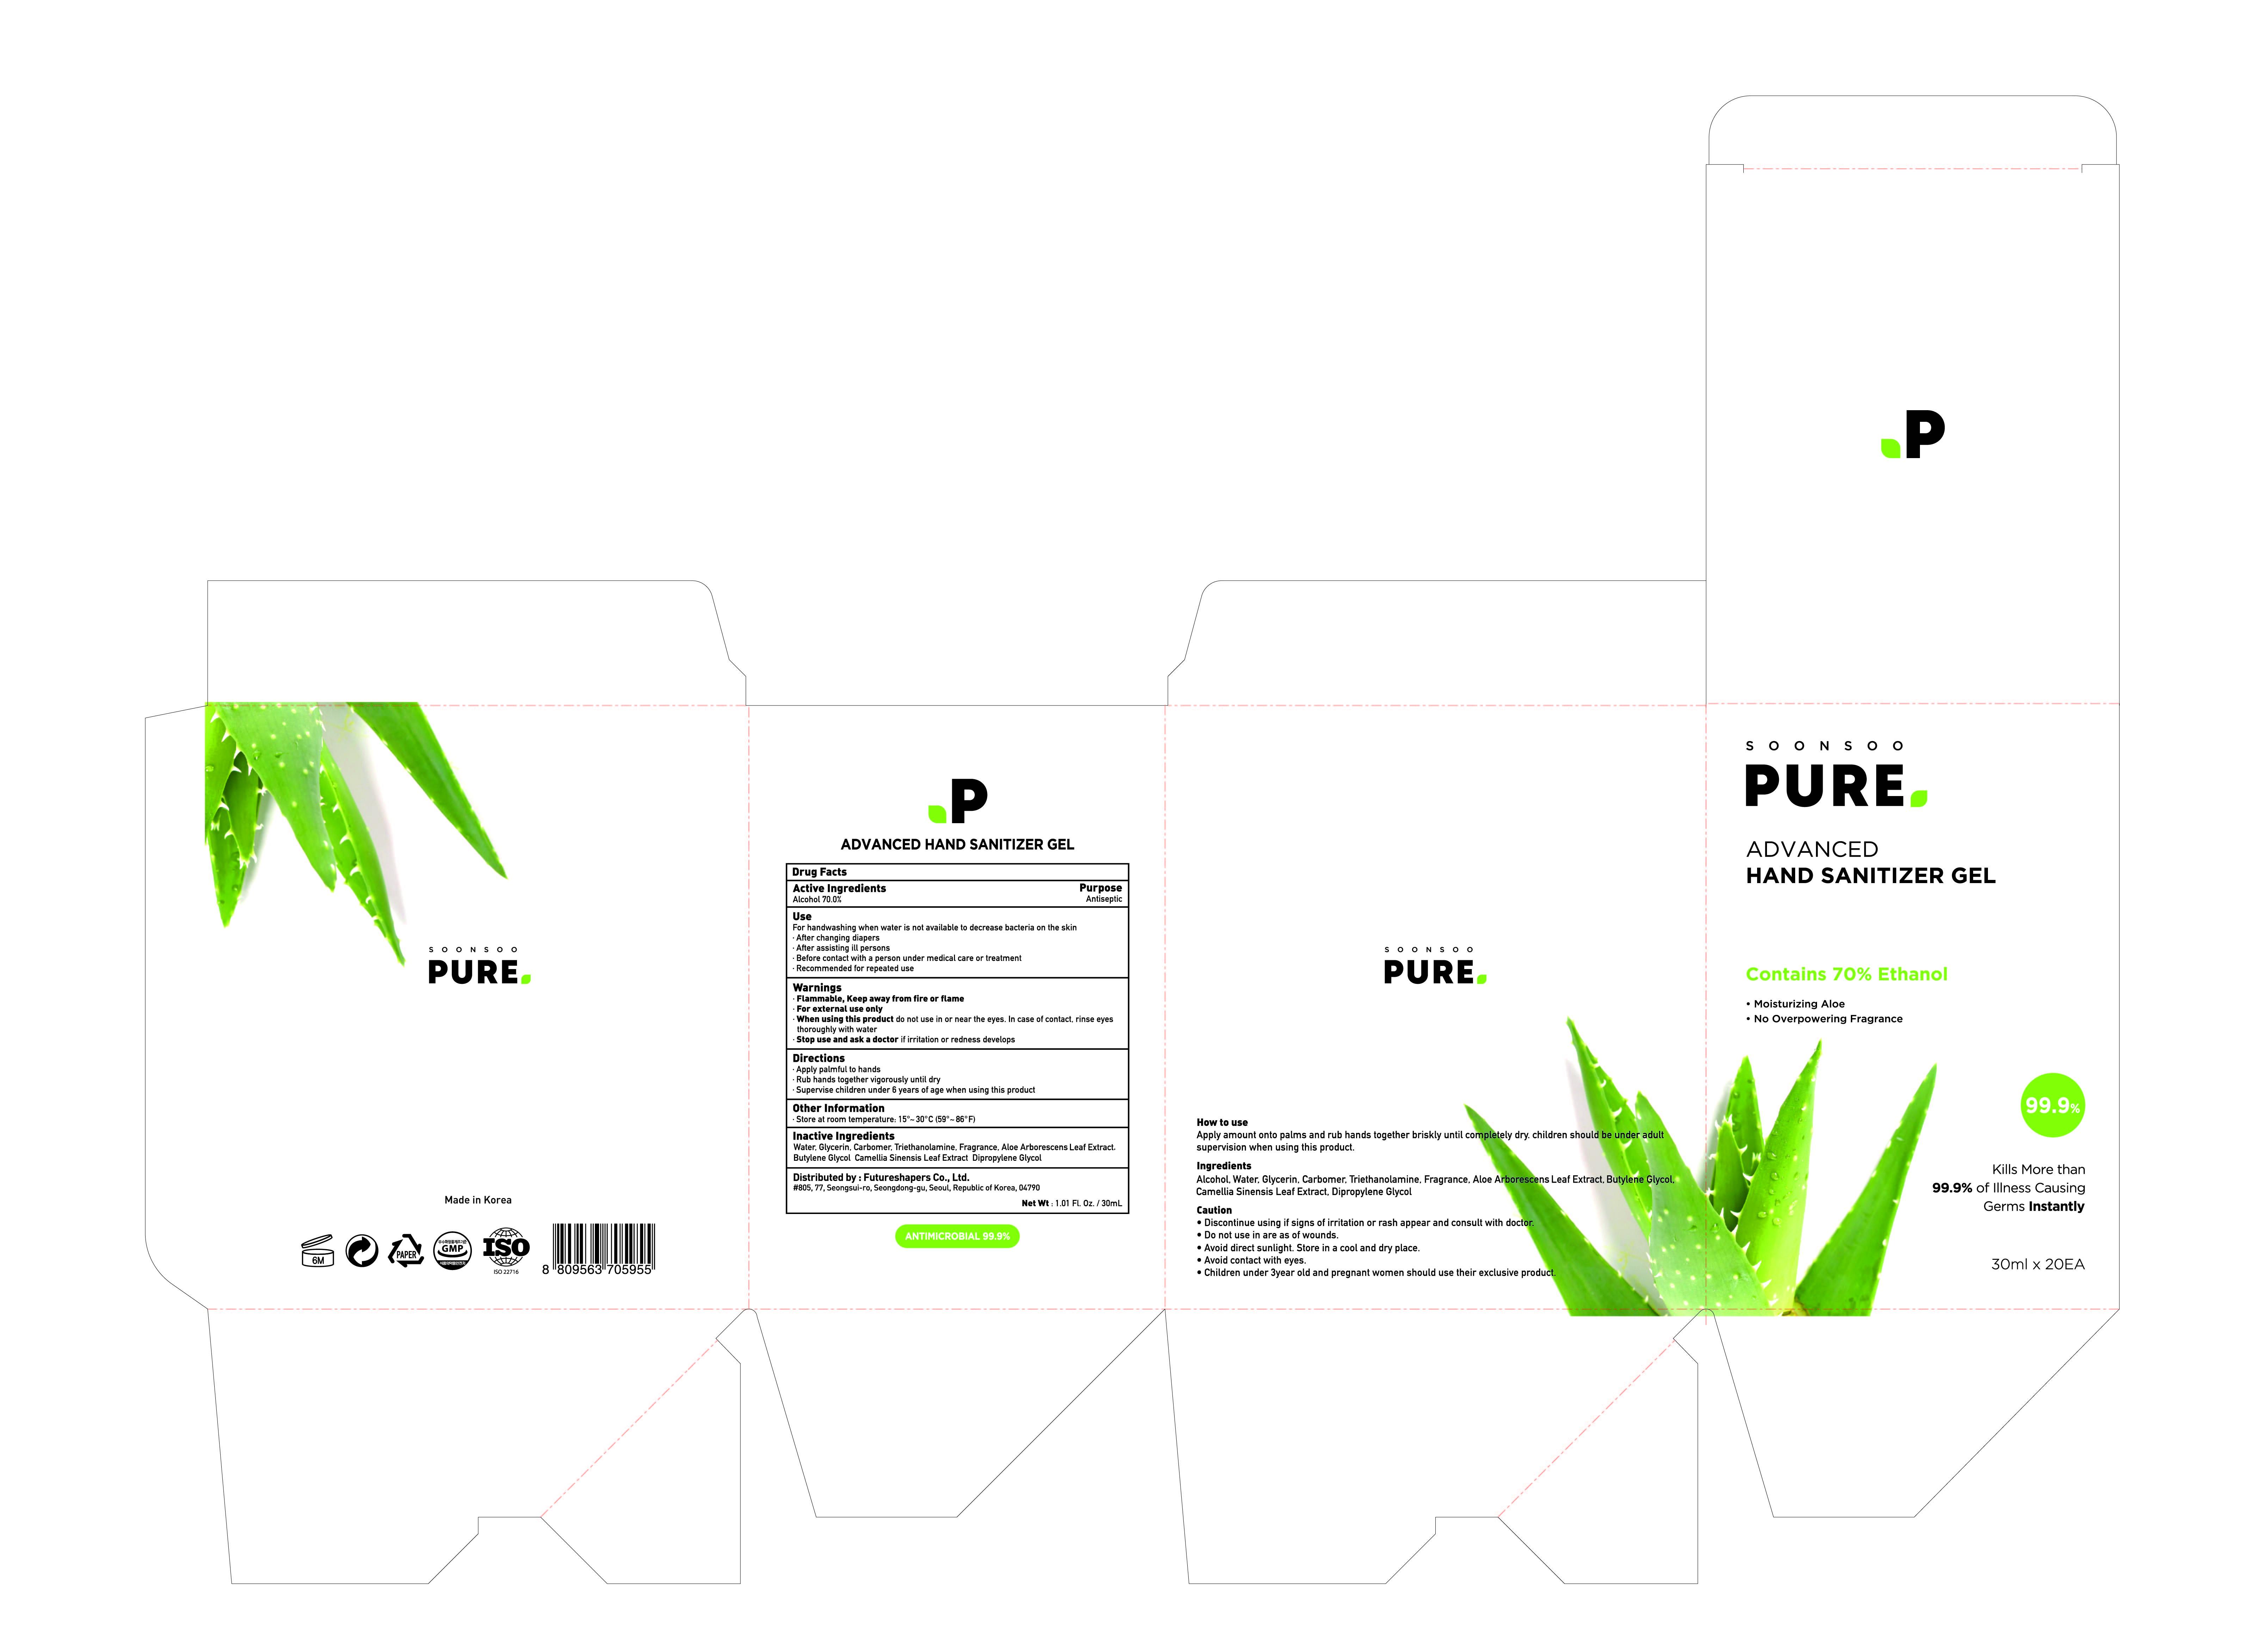 Soonsoo Pure Advanced Hand Sanitizer Gel